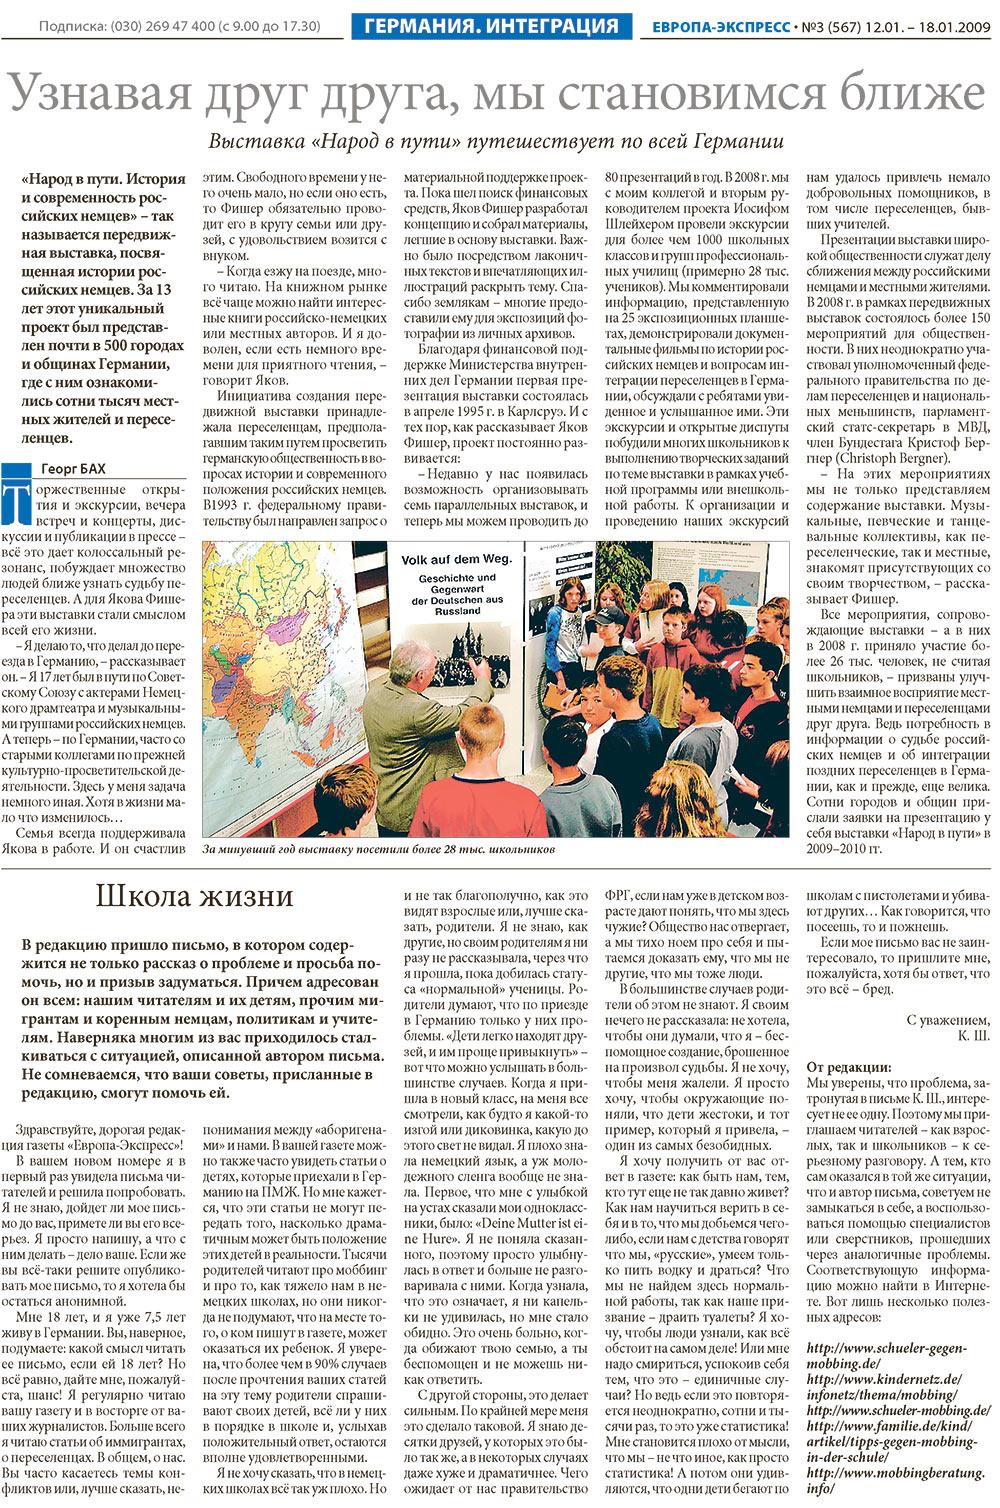 Европа экспресс (газета). 2009 год, номер 1, стр. 4